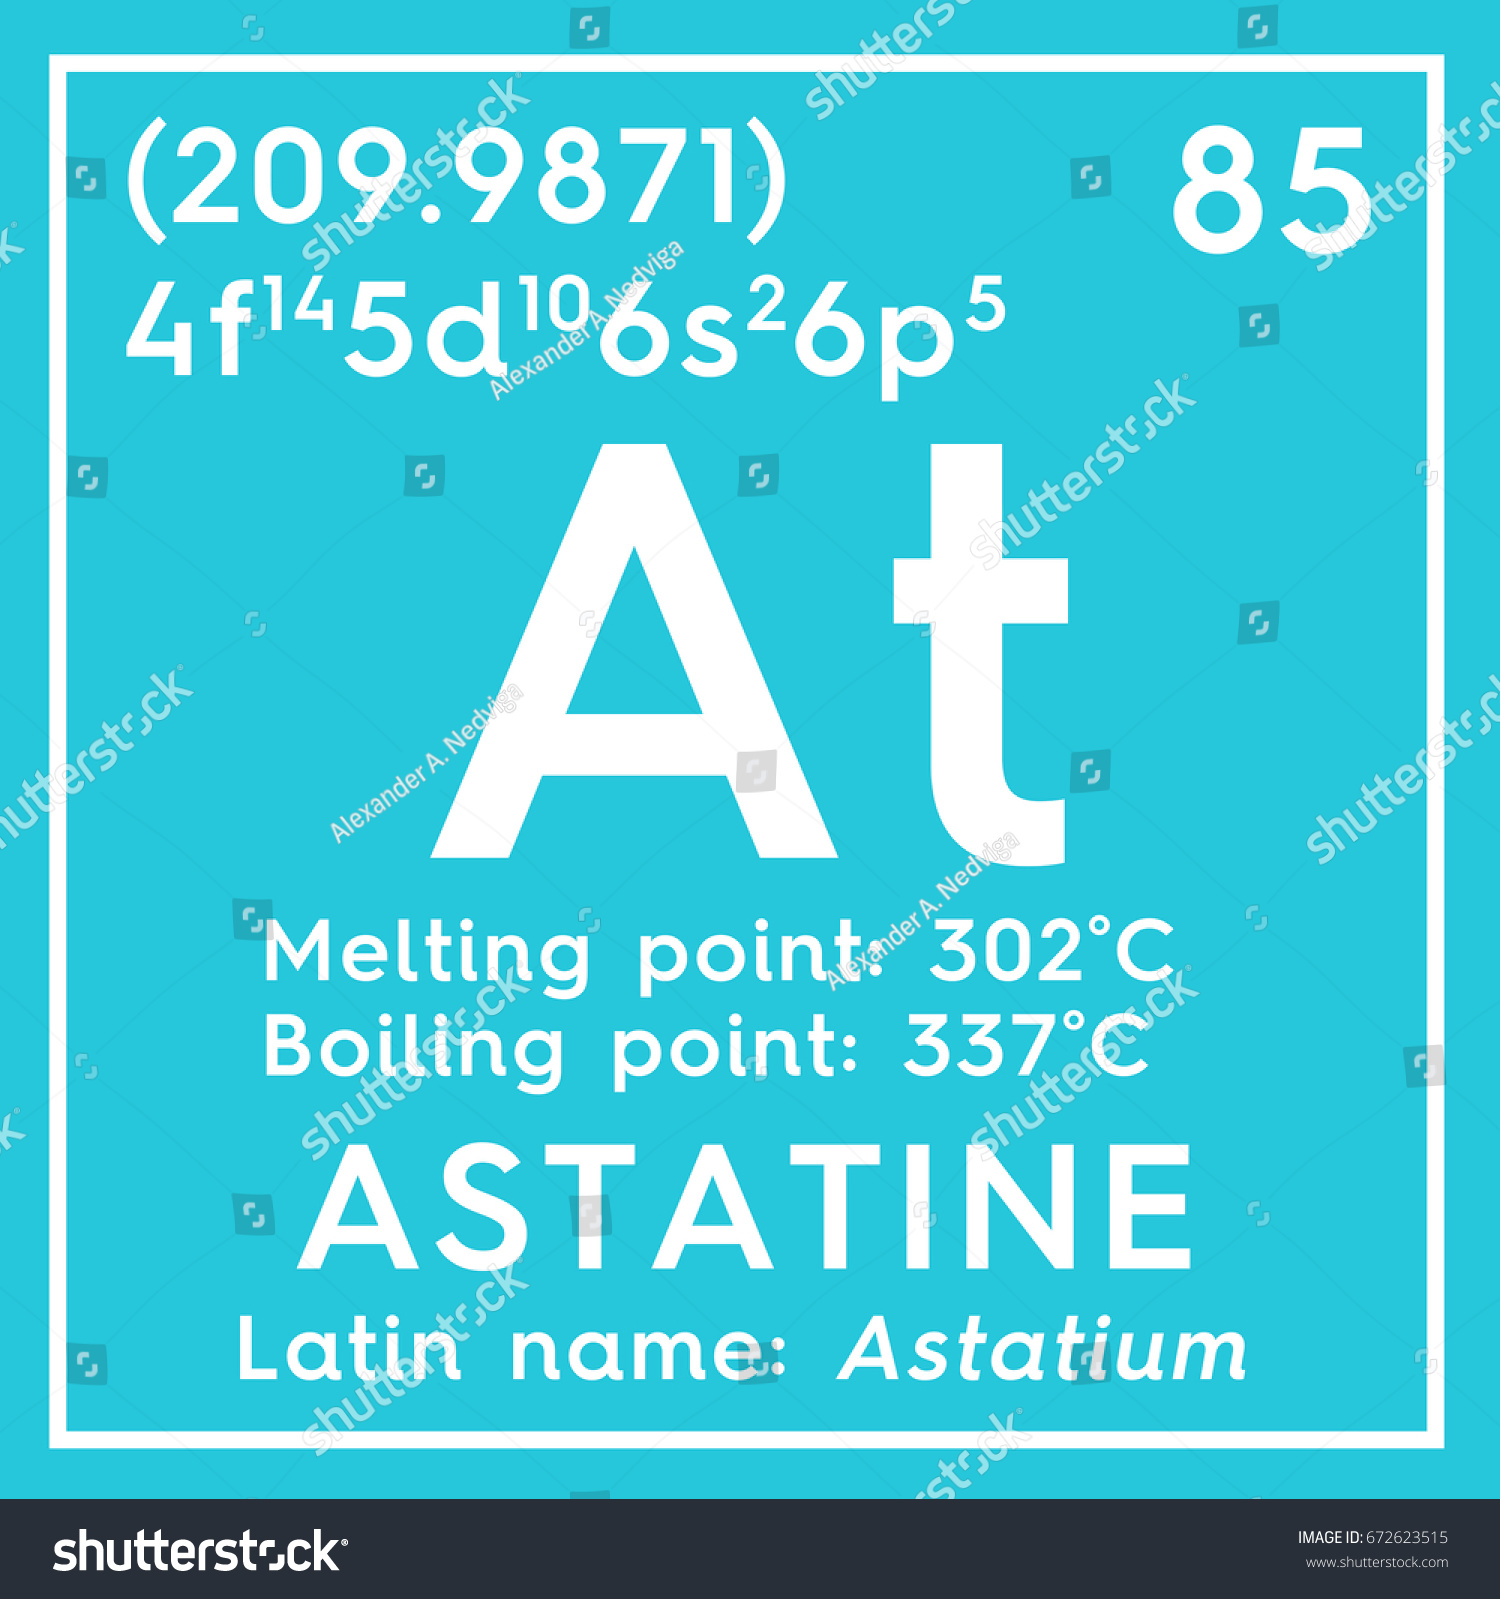 Astatine astatium halogens chemical element mendeleevs stock astatine astatium halogens chemical element of mendeleevs periodic table astatine in square gamestrikefo Image collections